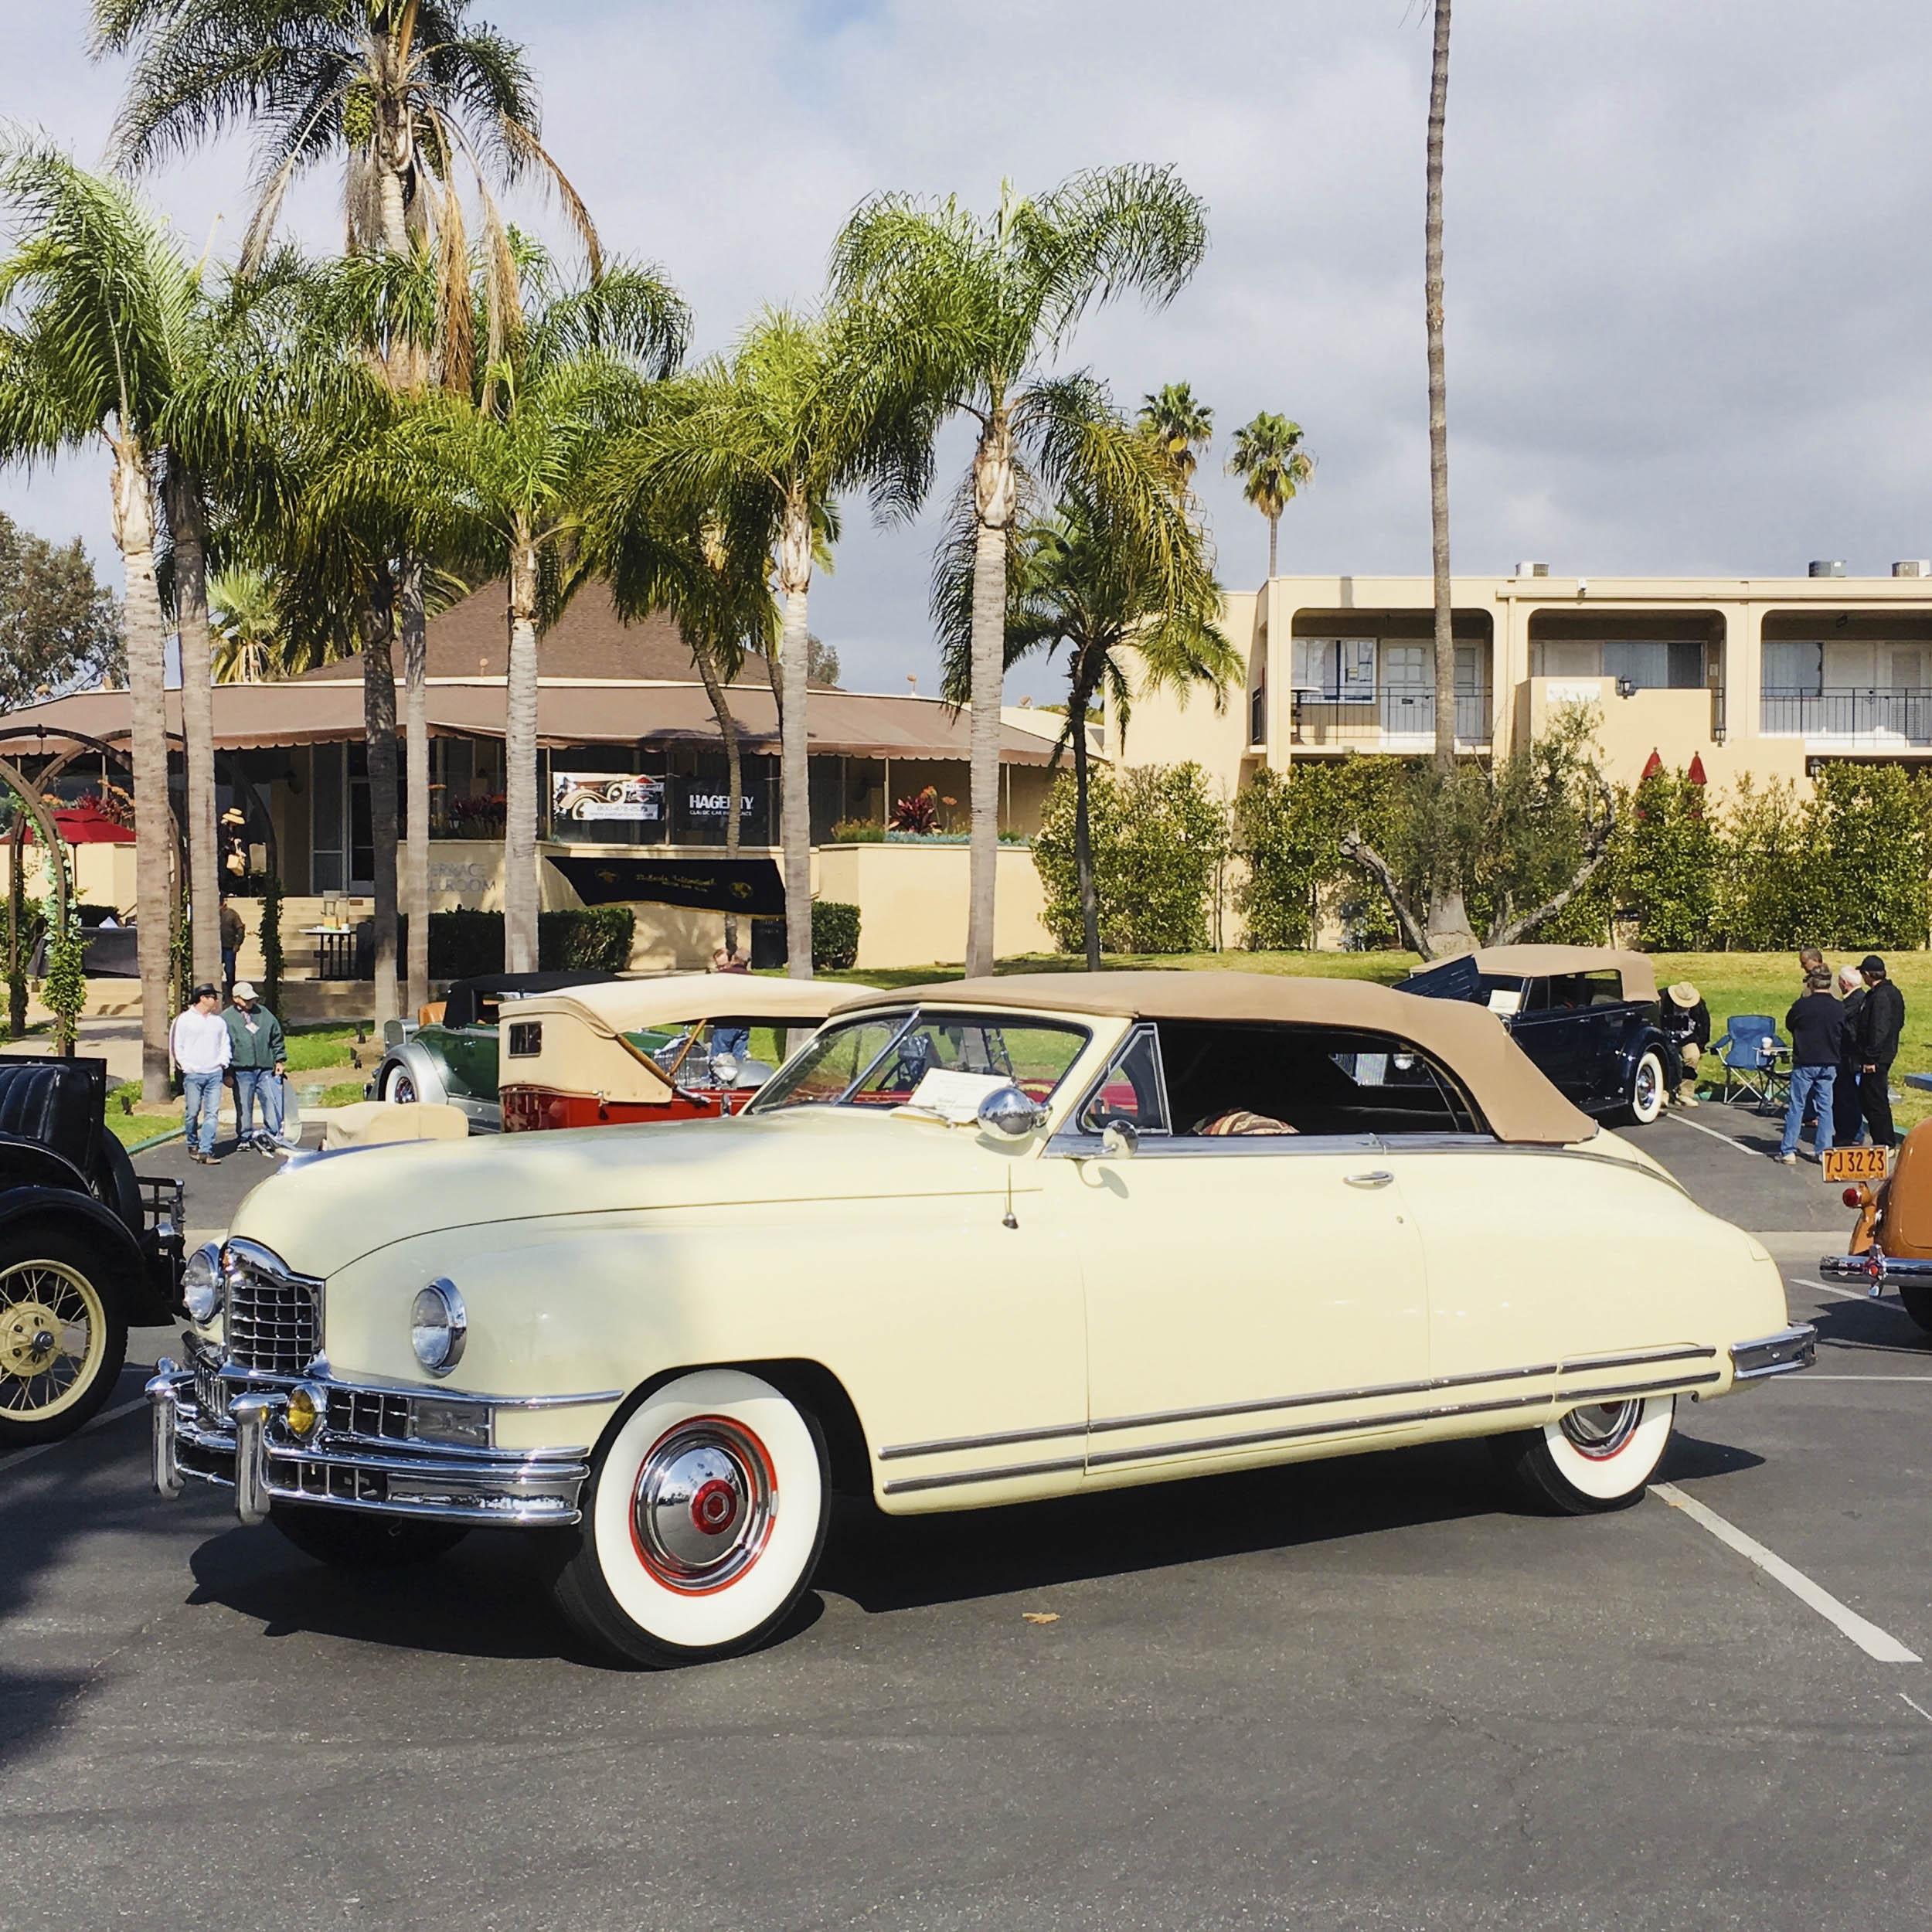 1950 Packard custom 8 victoria convertible